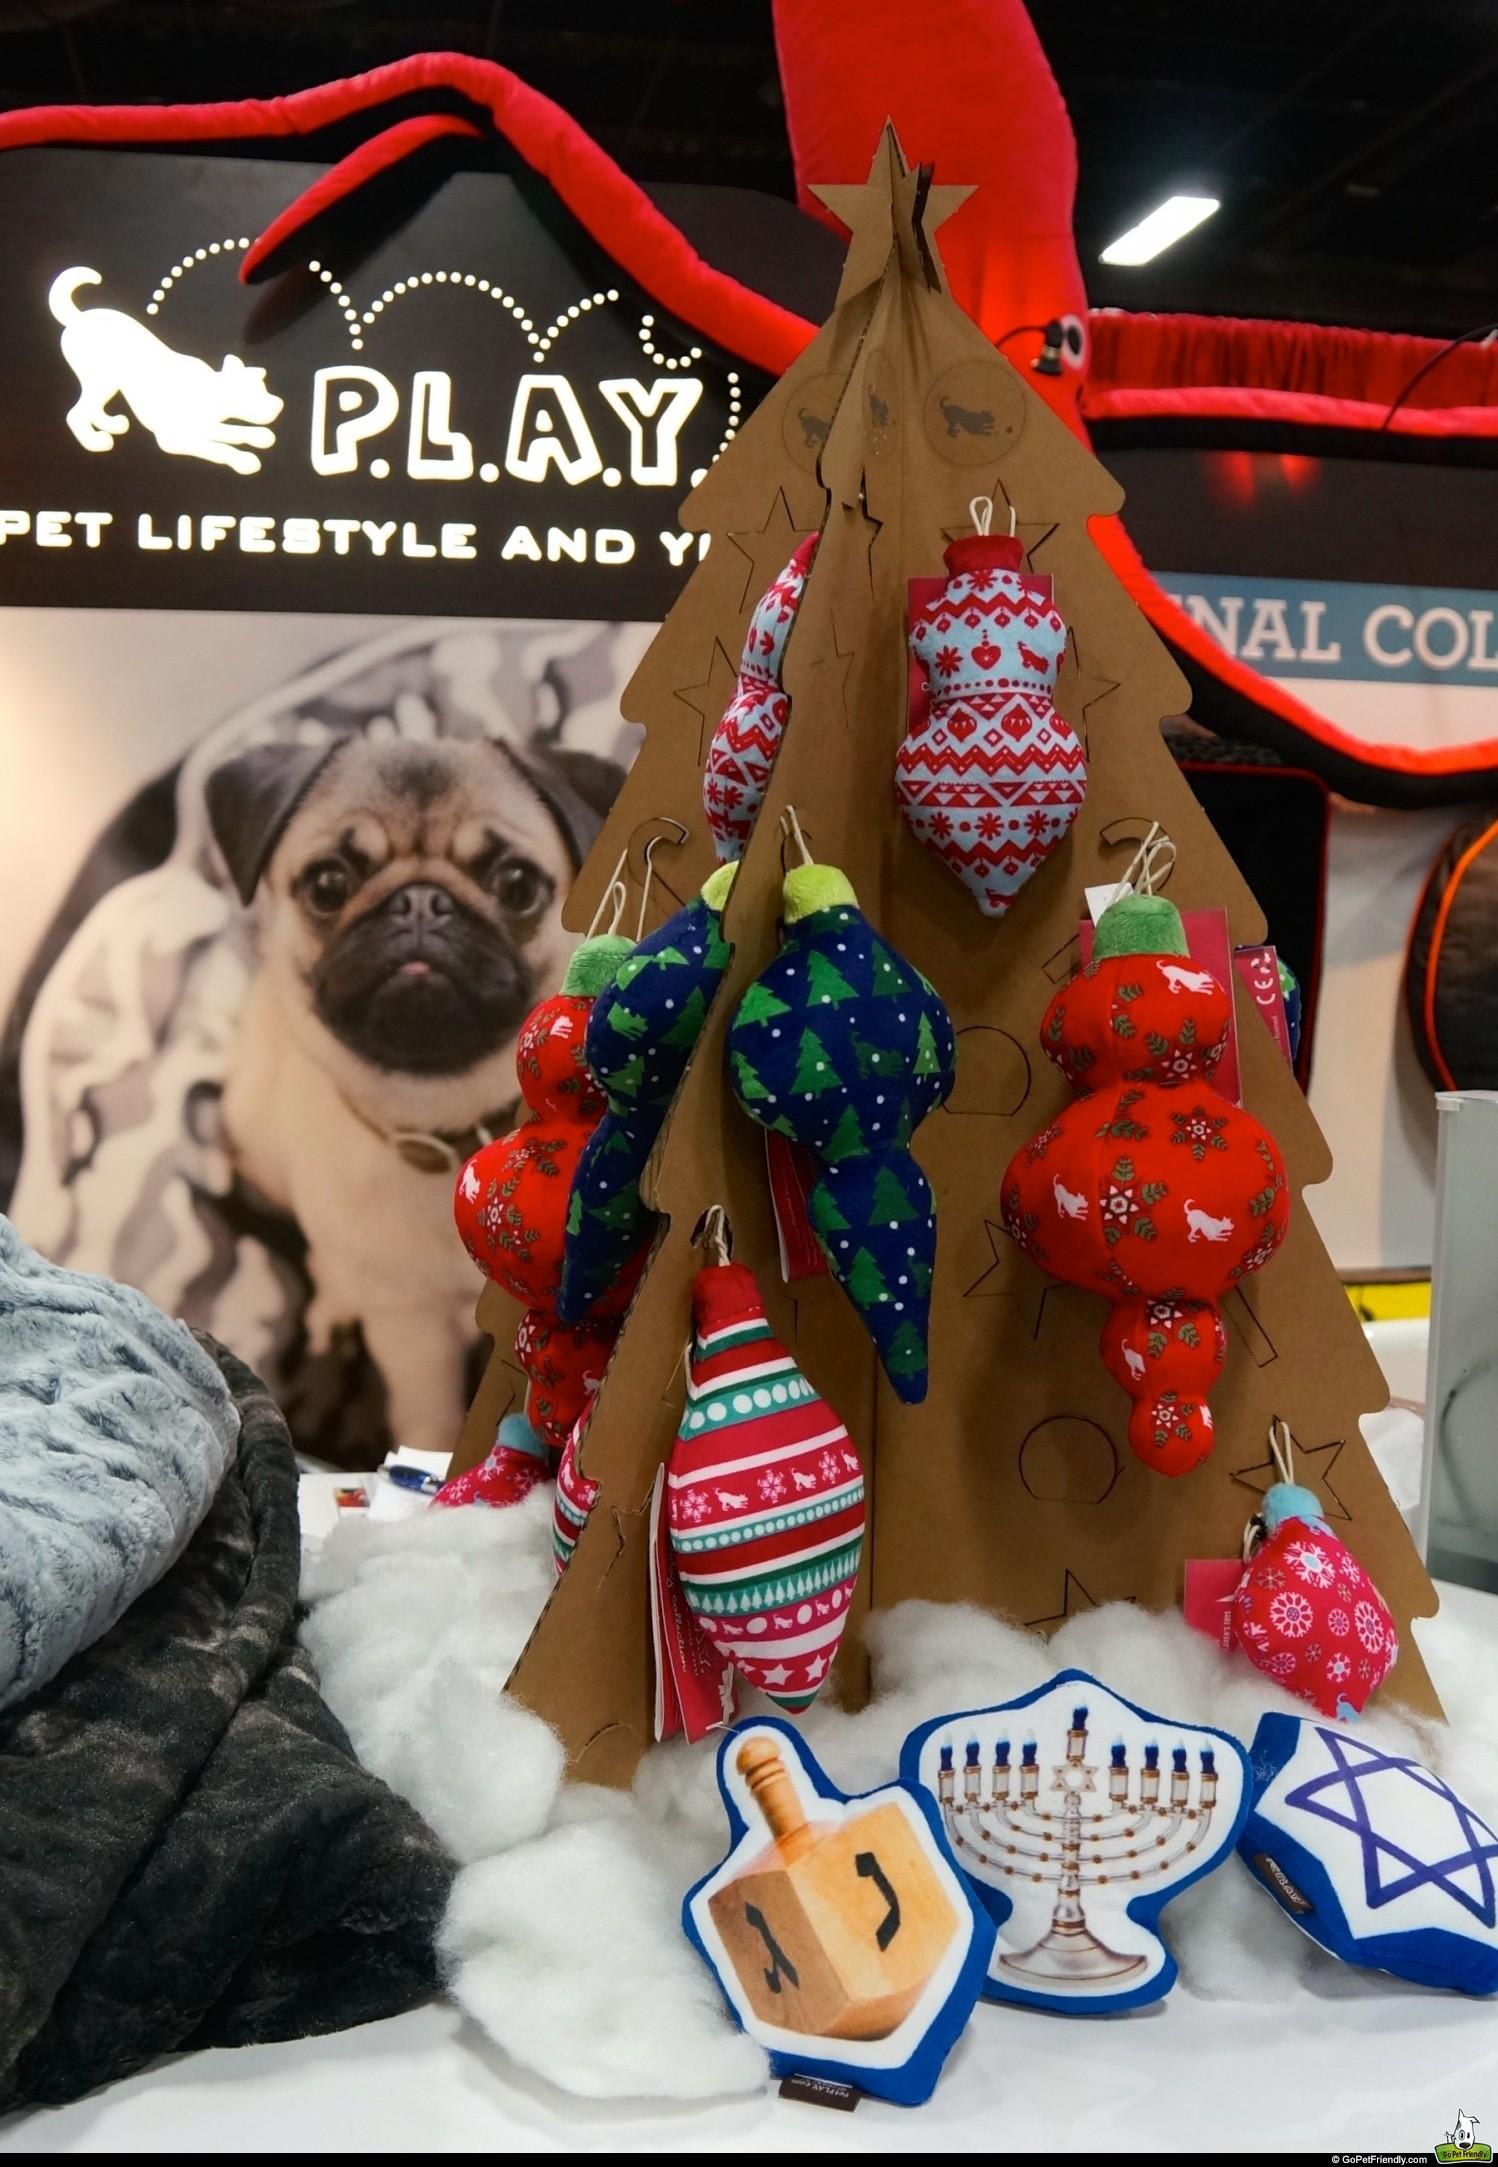 P.L.A.Y. Ornament Toys